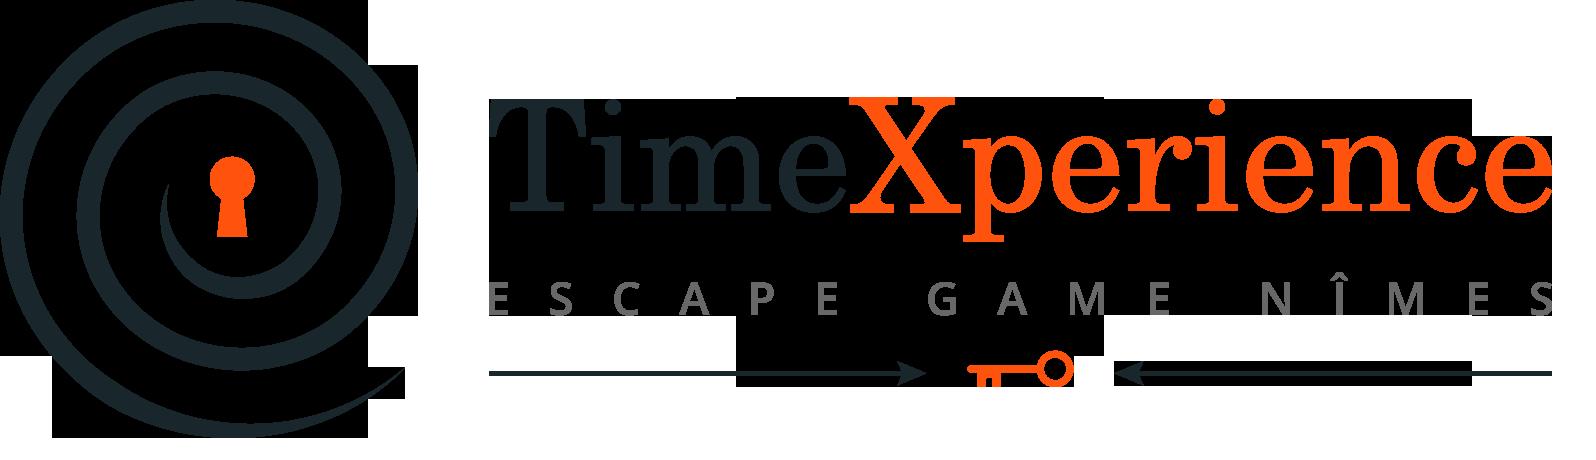 TimeXperience - Escape Game Nîmes